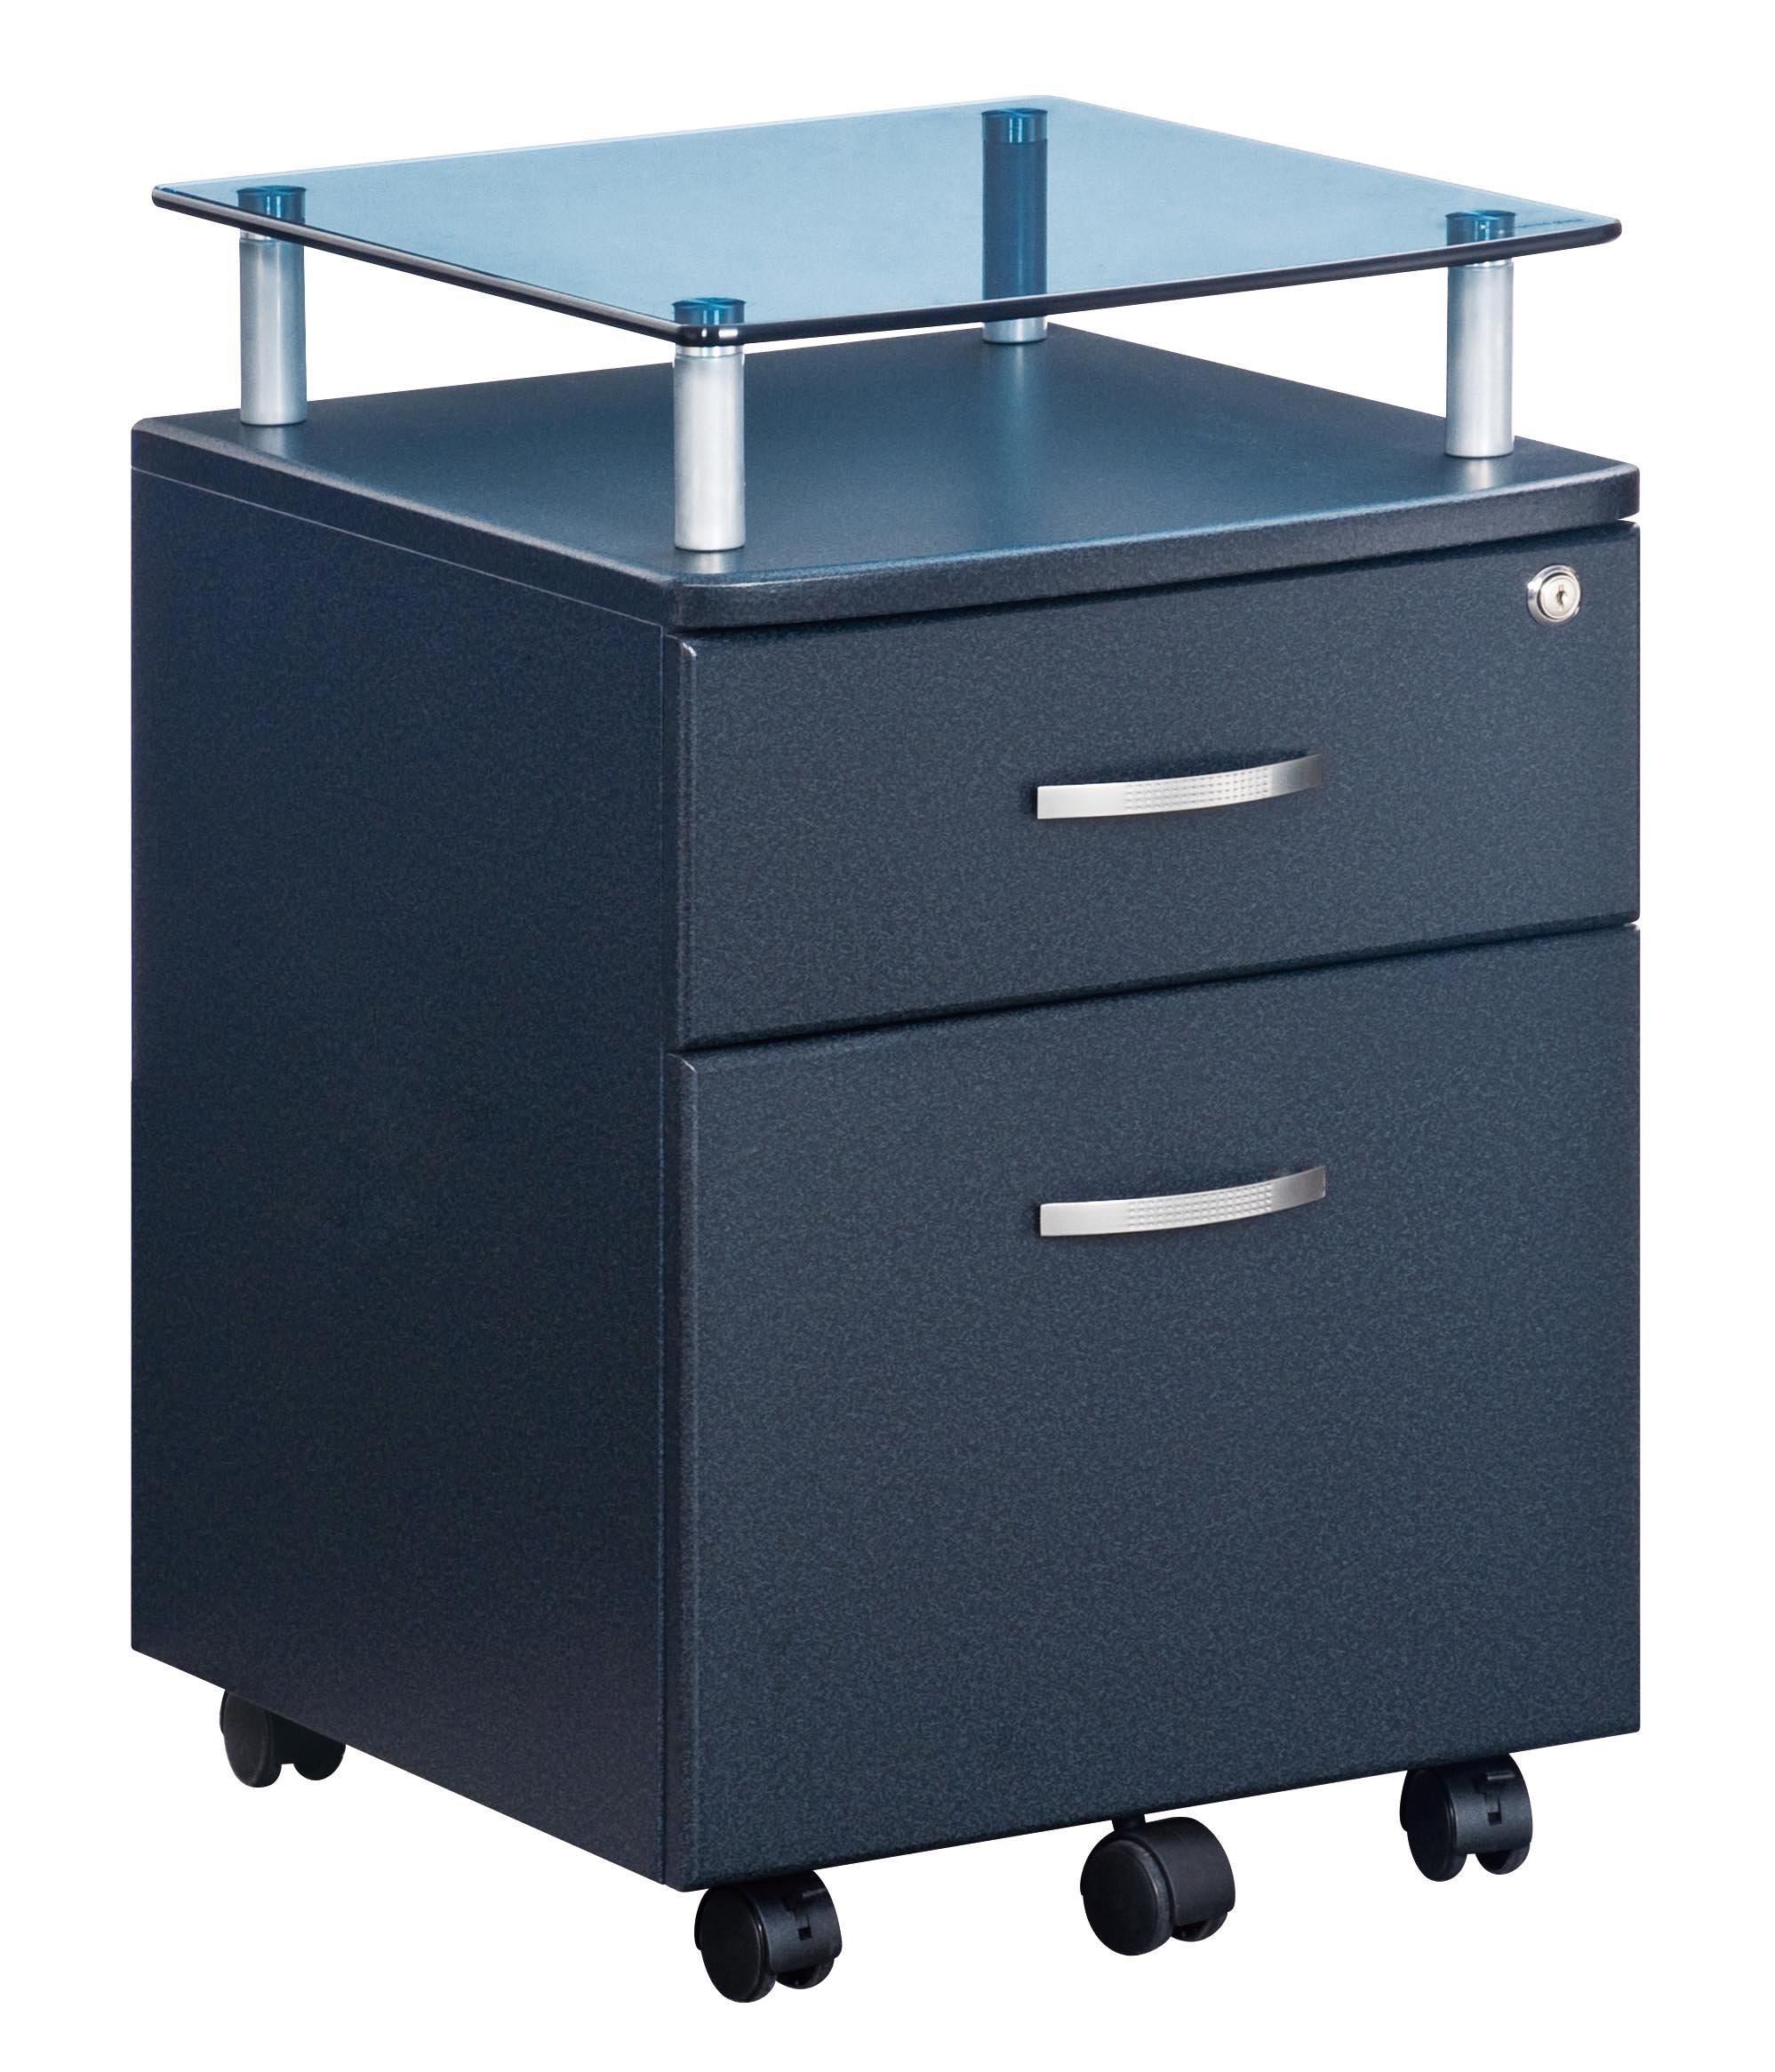 Techni Mobili RTA-S06-GPH06 Rolling File Cabinet with Glass Top, Graphite by Techni Mobili